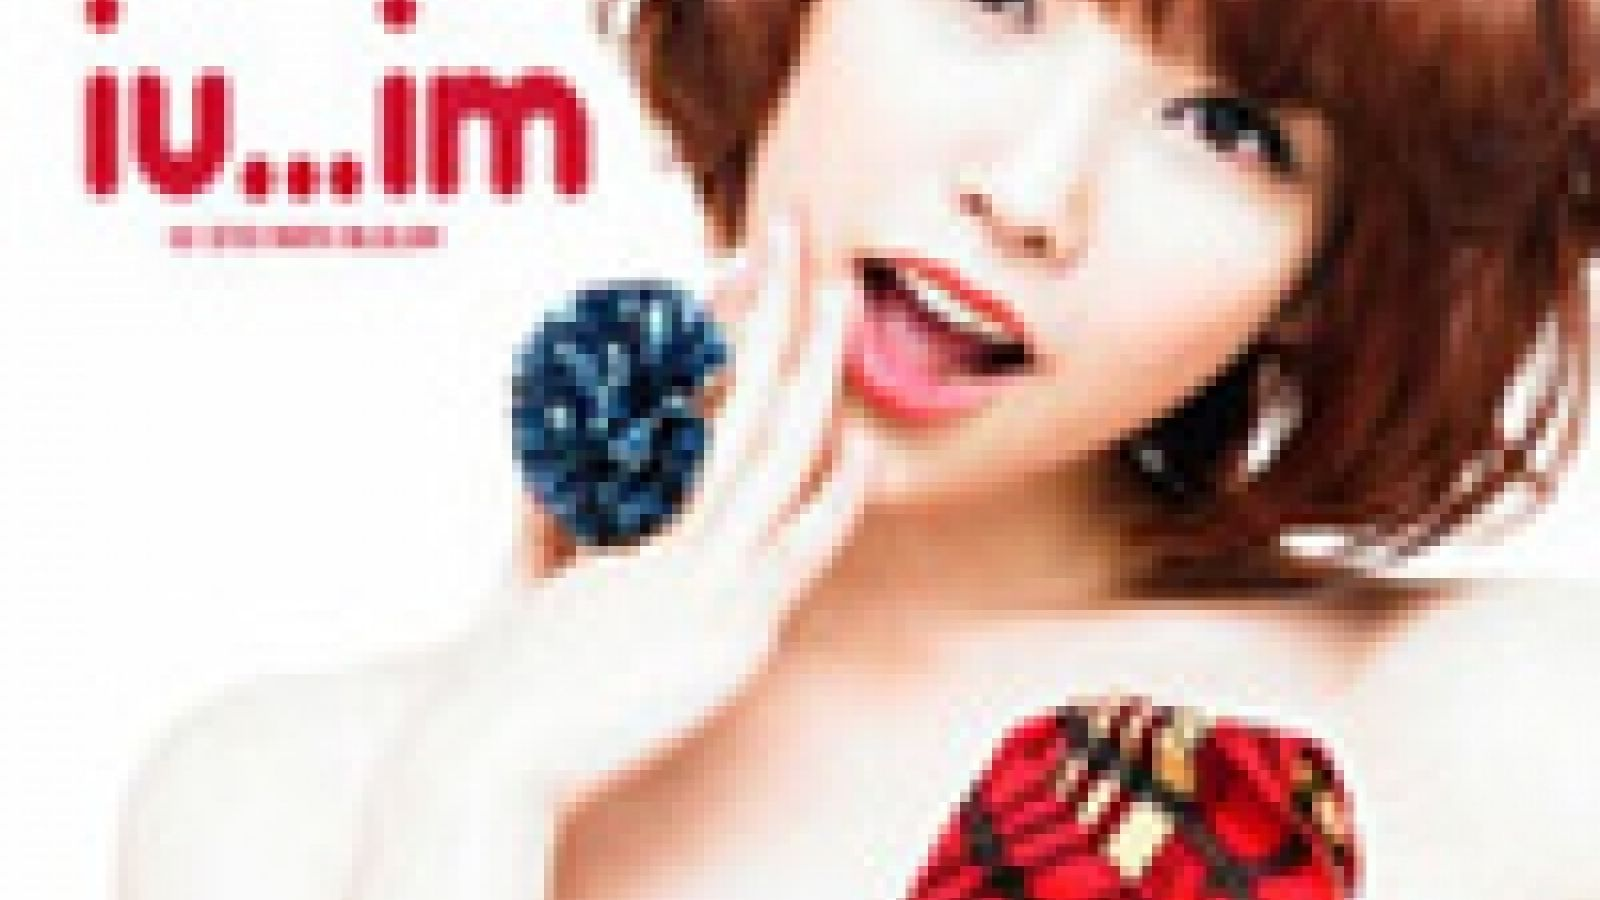 IU julkaisee toisen minialbuminsa © KoME